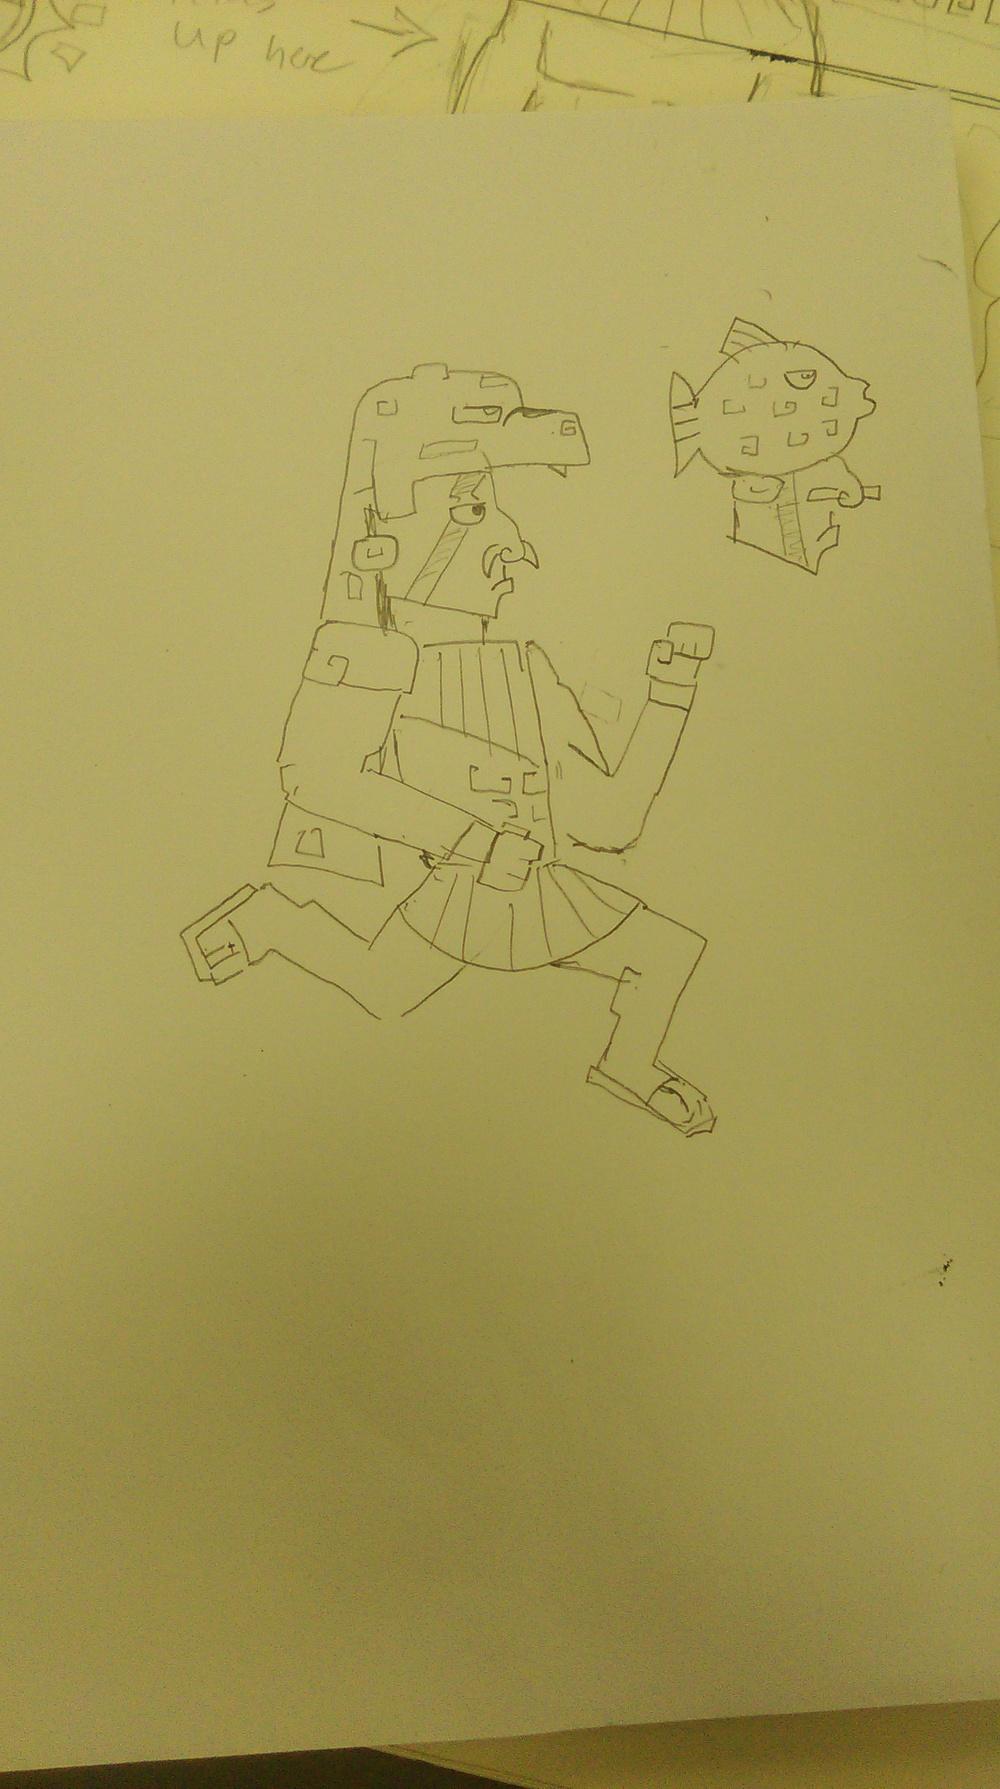 Character design sketch, Jaguar and Fish Warriors